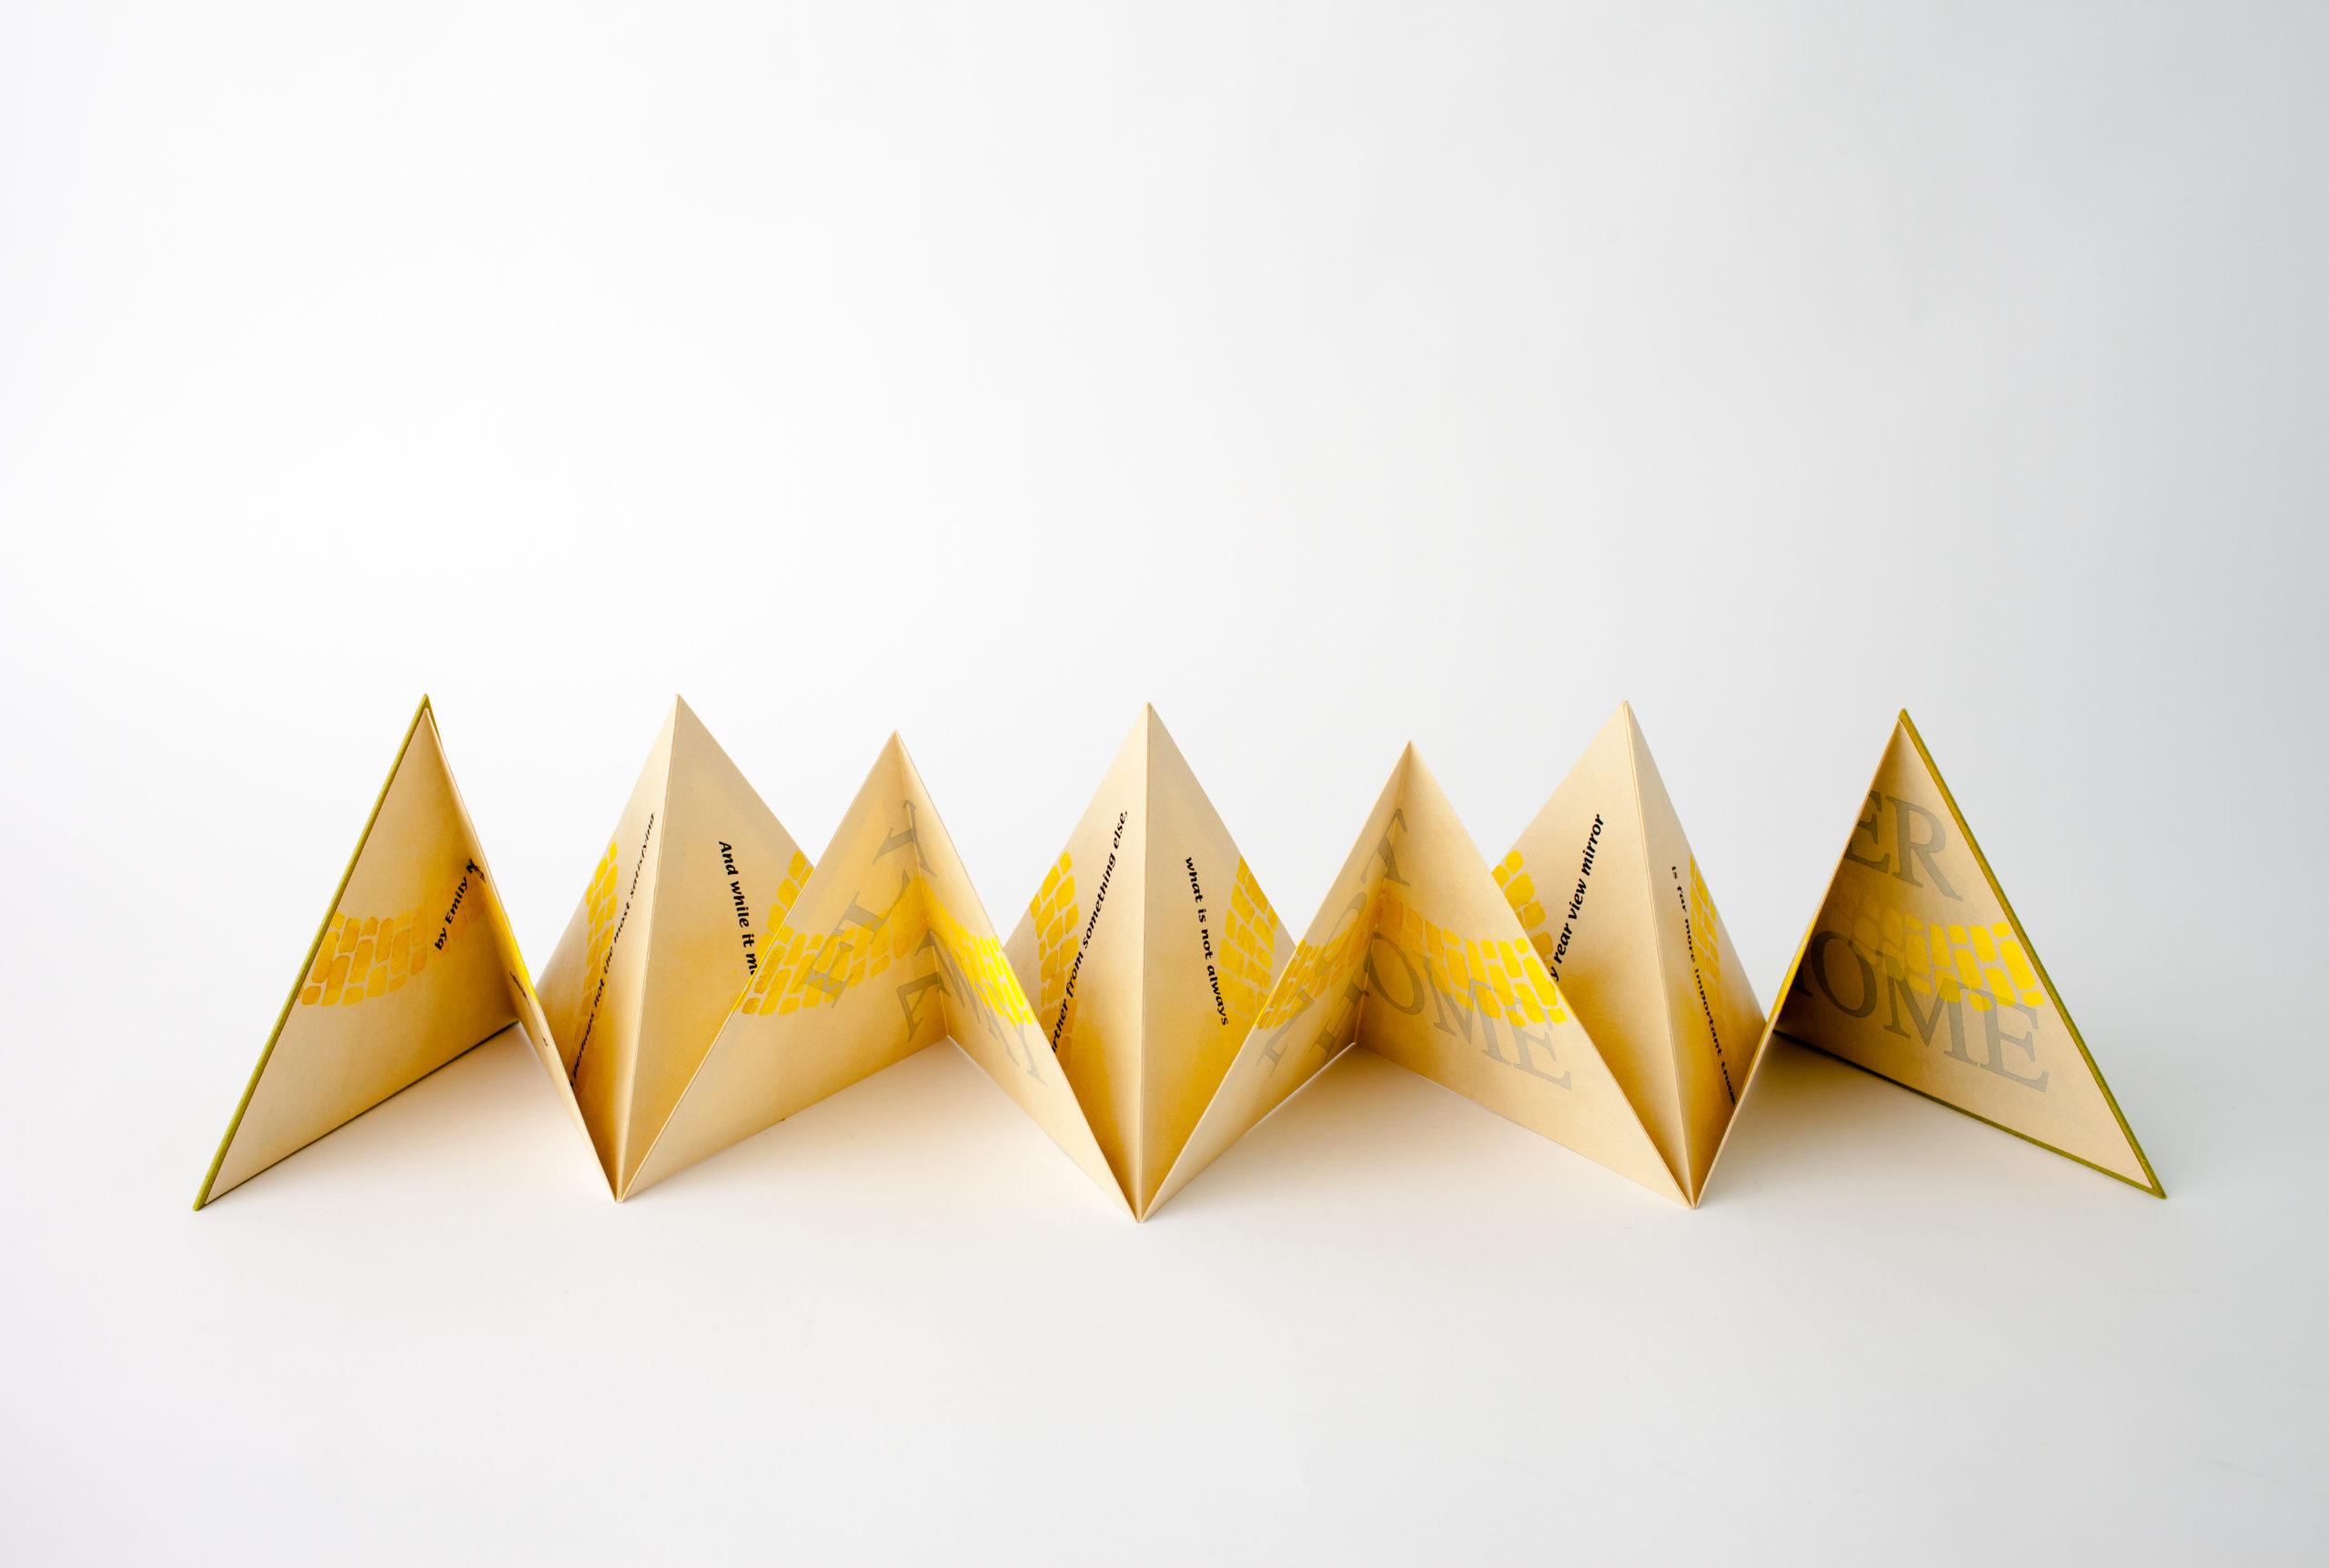 yellow triangular accordion book